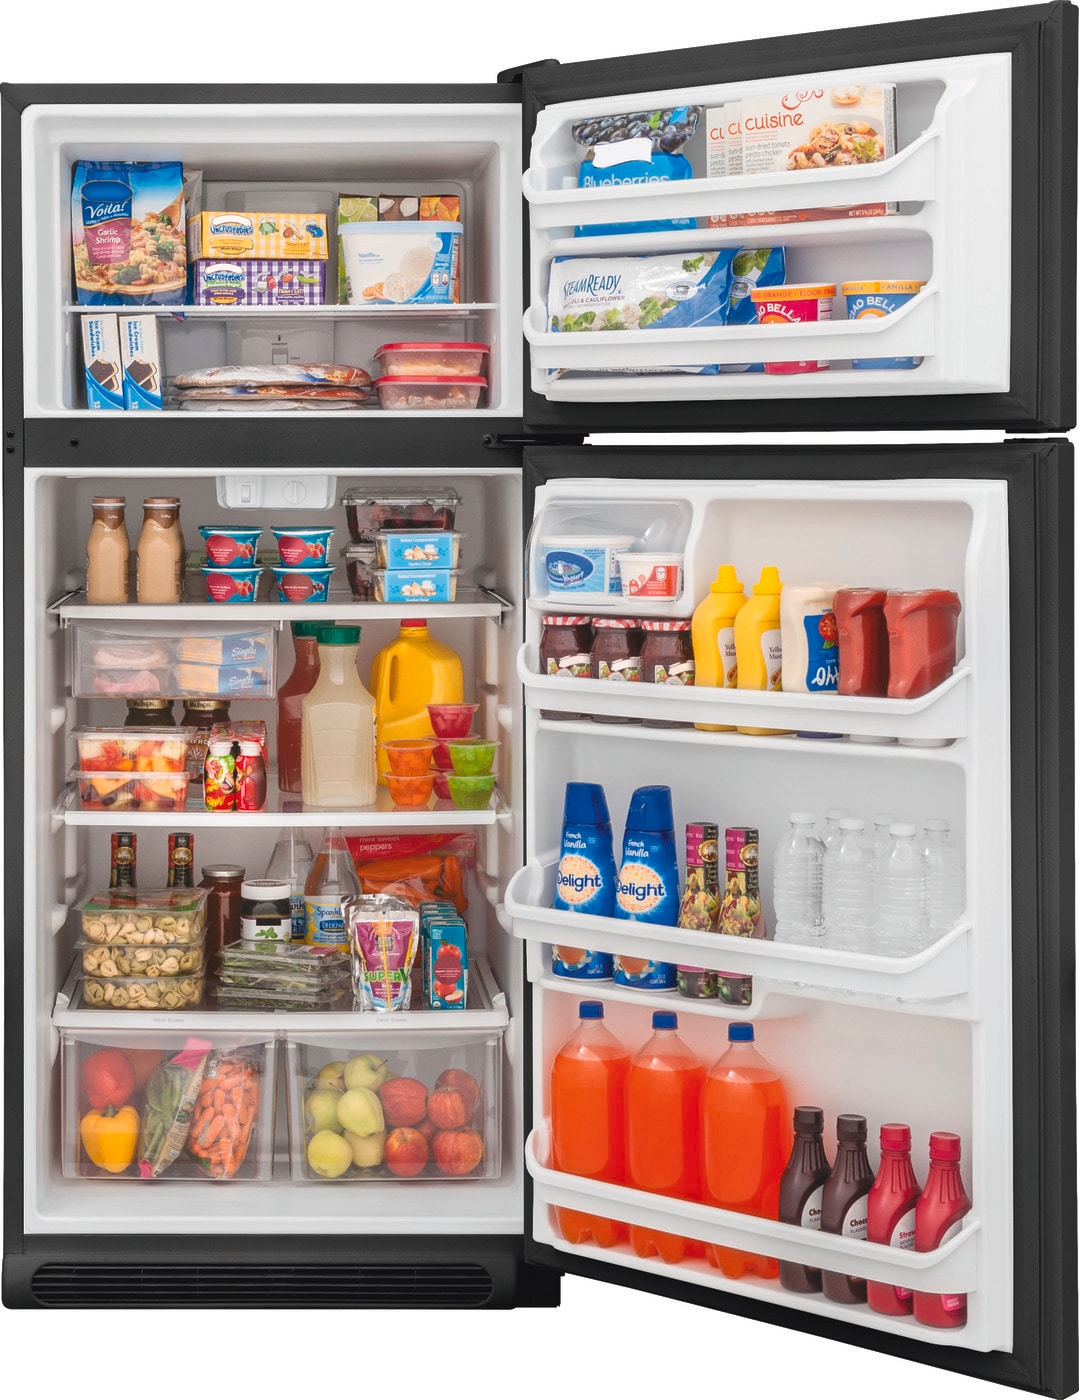 Model: FFTR1821TB   Frigidaire 18 Cu. Ft. Top Freezer Refrigerator